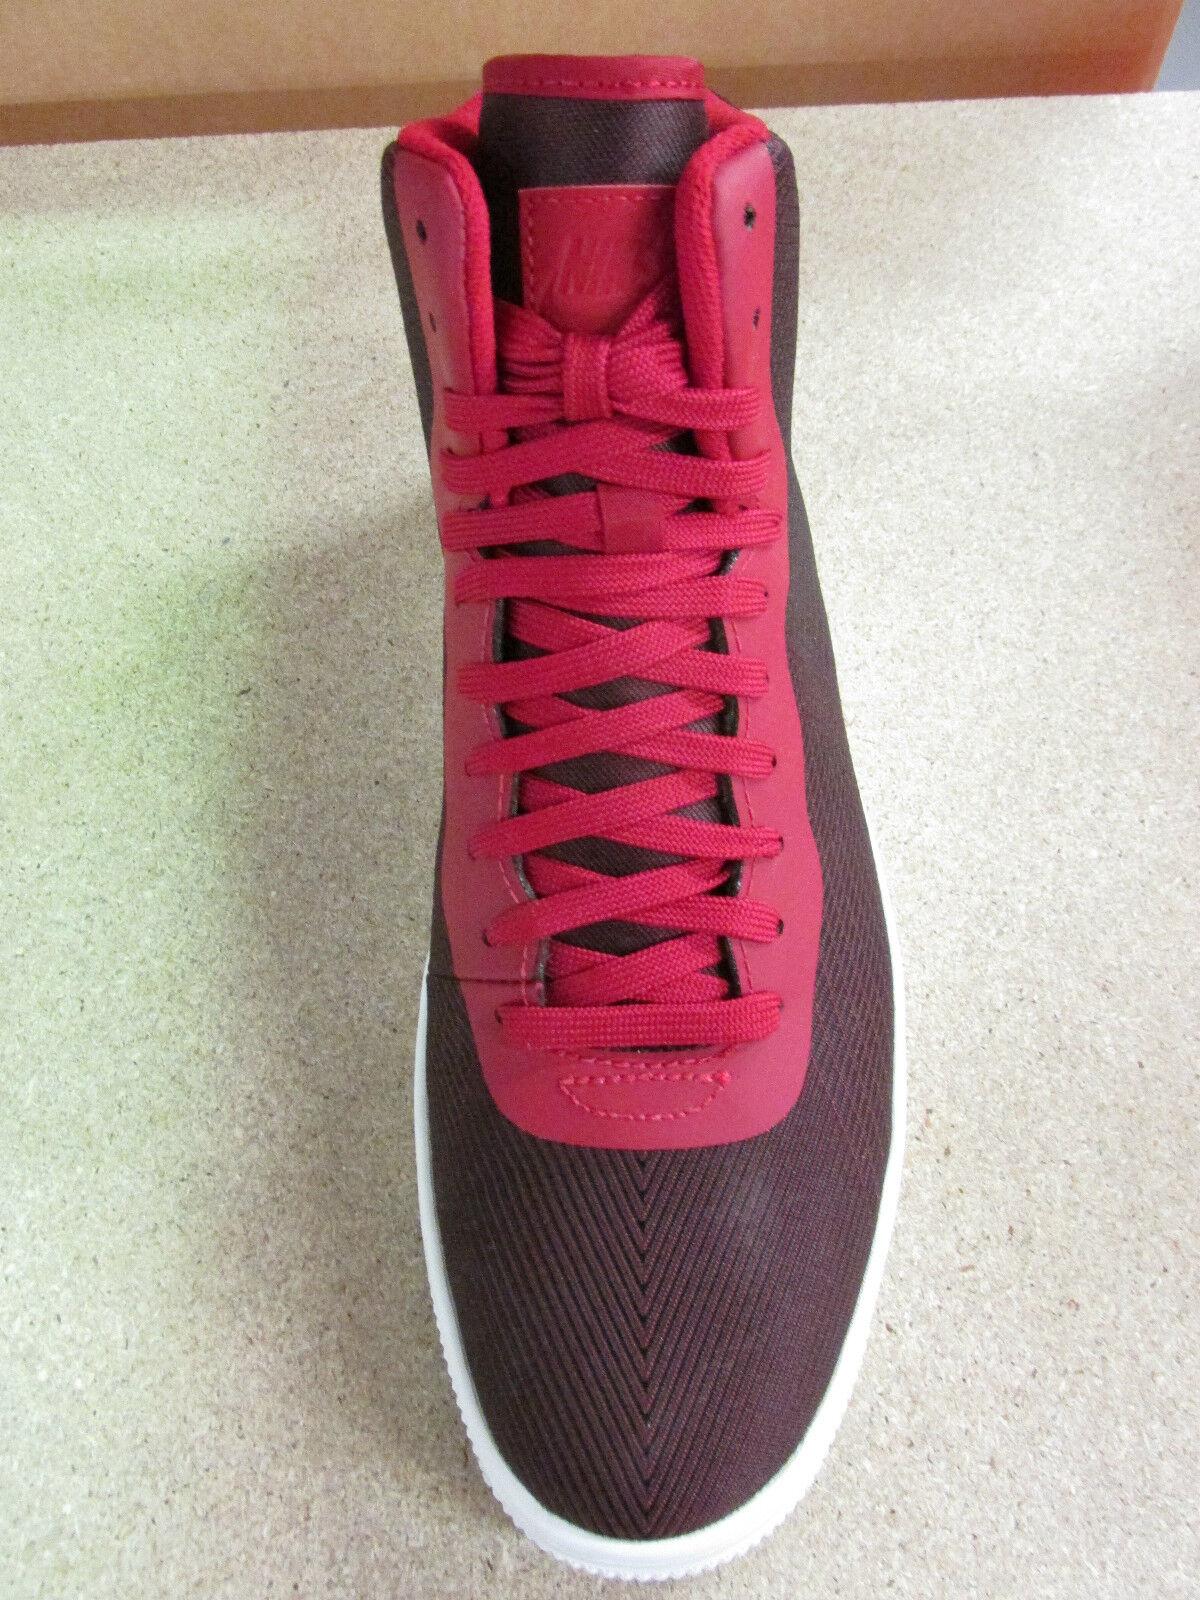 Nike nsw hi pro schritt - mens hi nsw top - trainer 776086 600 Turnschuhe, schuhe 82765f